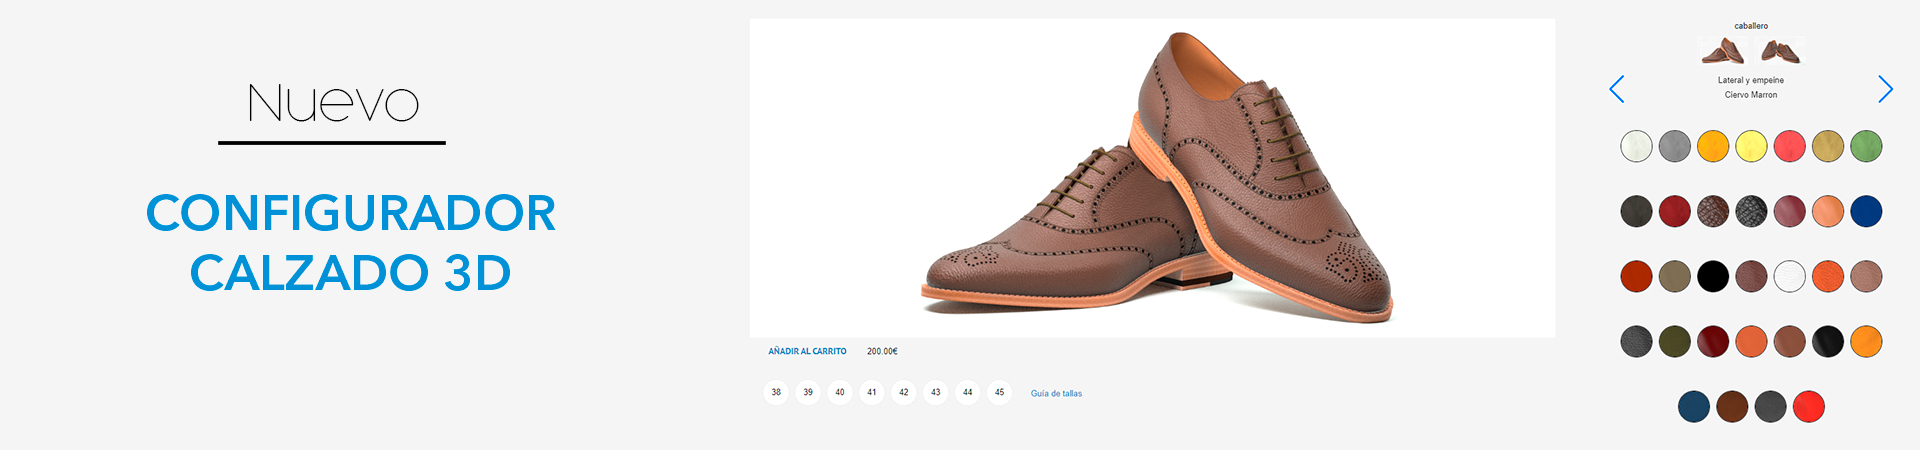 configuraodr calzado 3d calzado